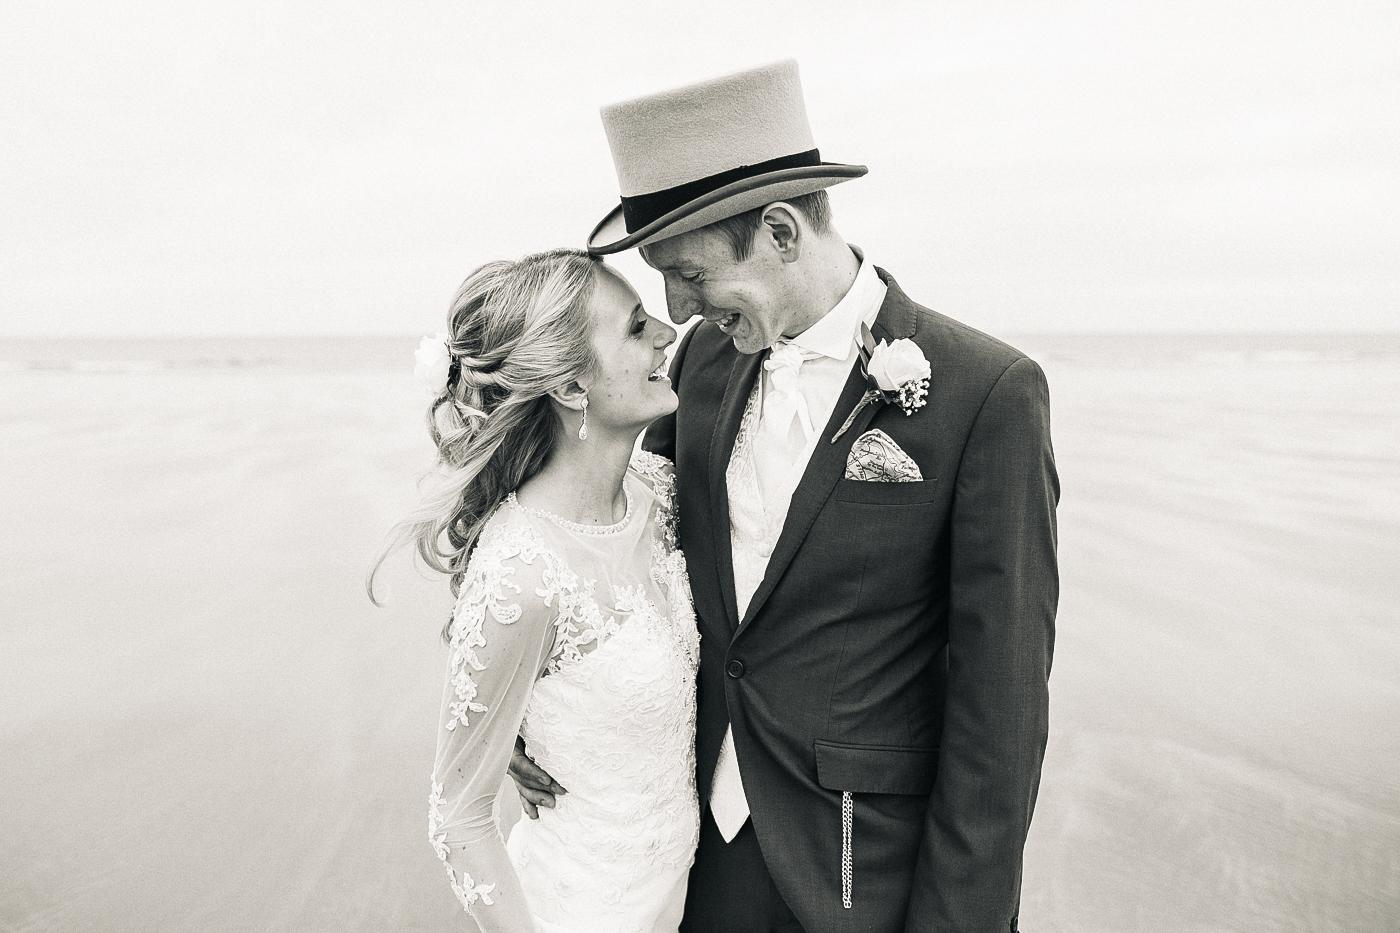 creative-wedding-photography-teesside-north-east-yorkshire-91.jpg